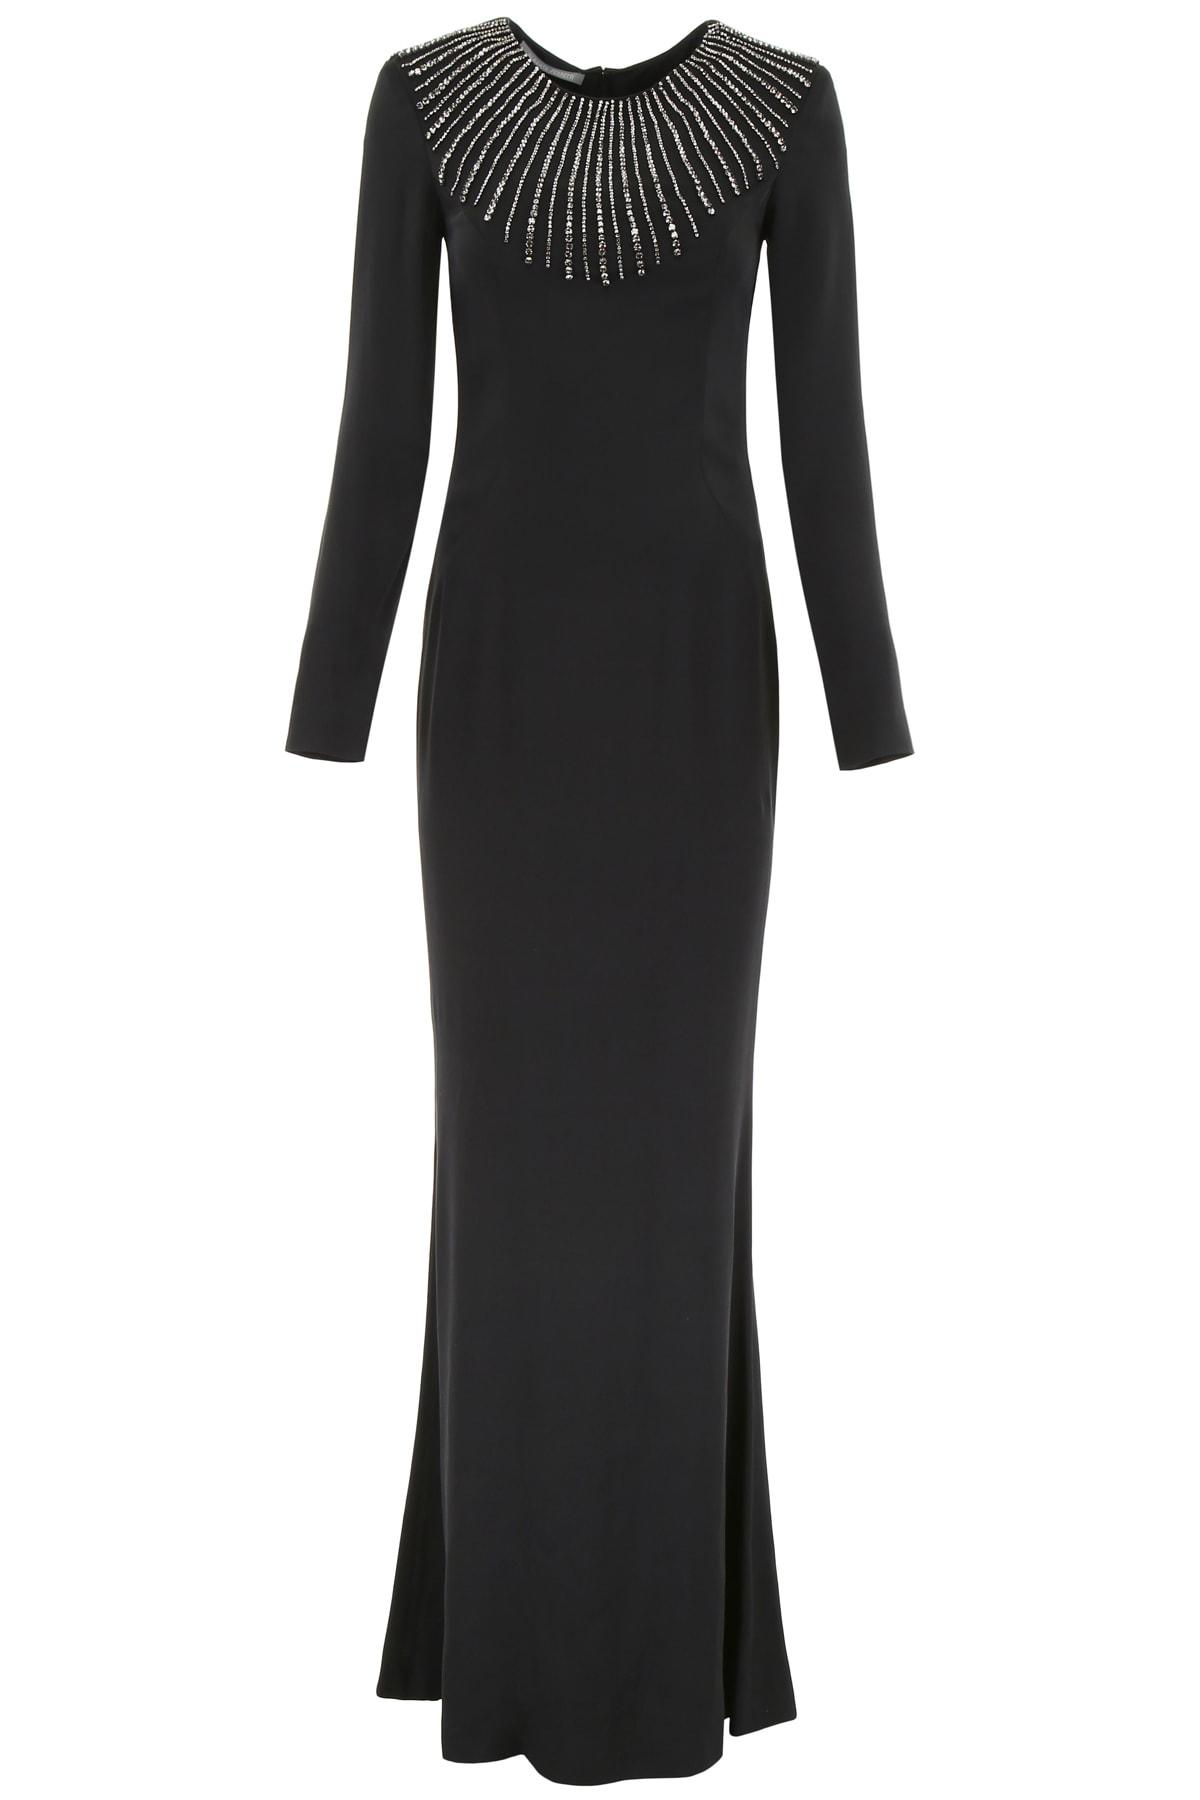 Buy Alberta Ferretti Maxi Dress With Crystals online, shop Alberta Ferretti with free shipping